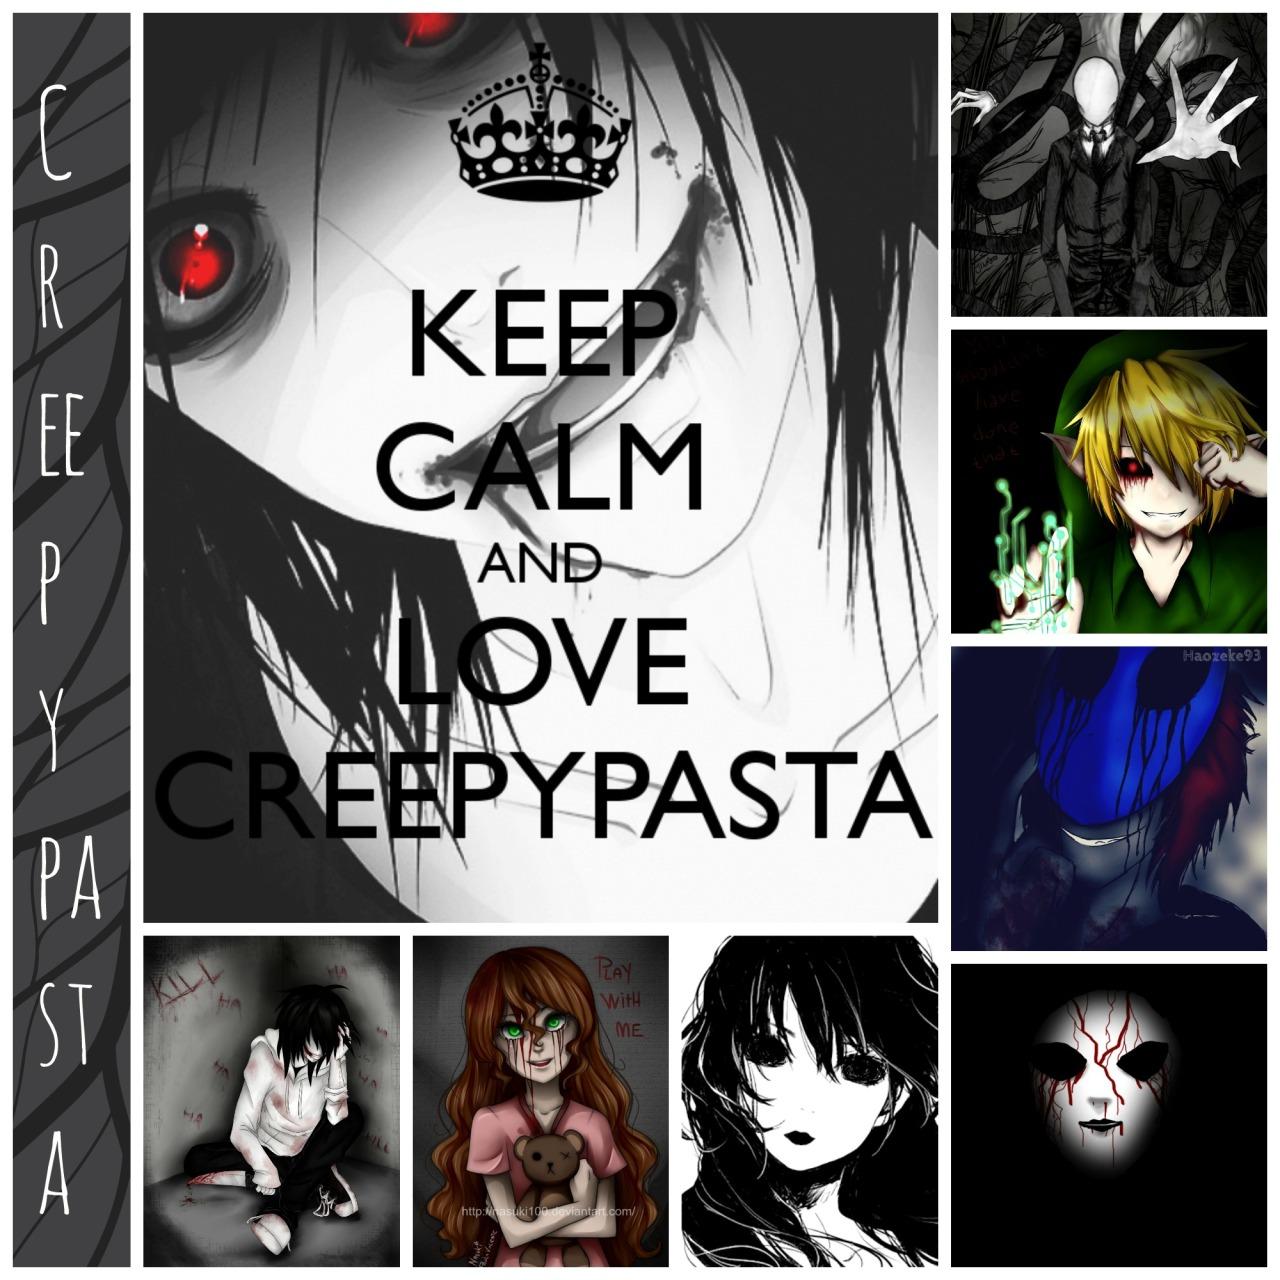 Keep Calm And Love Creepypasta Proxy